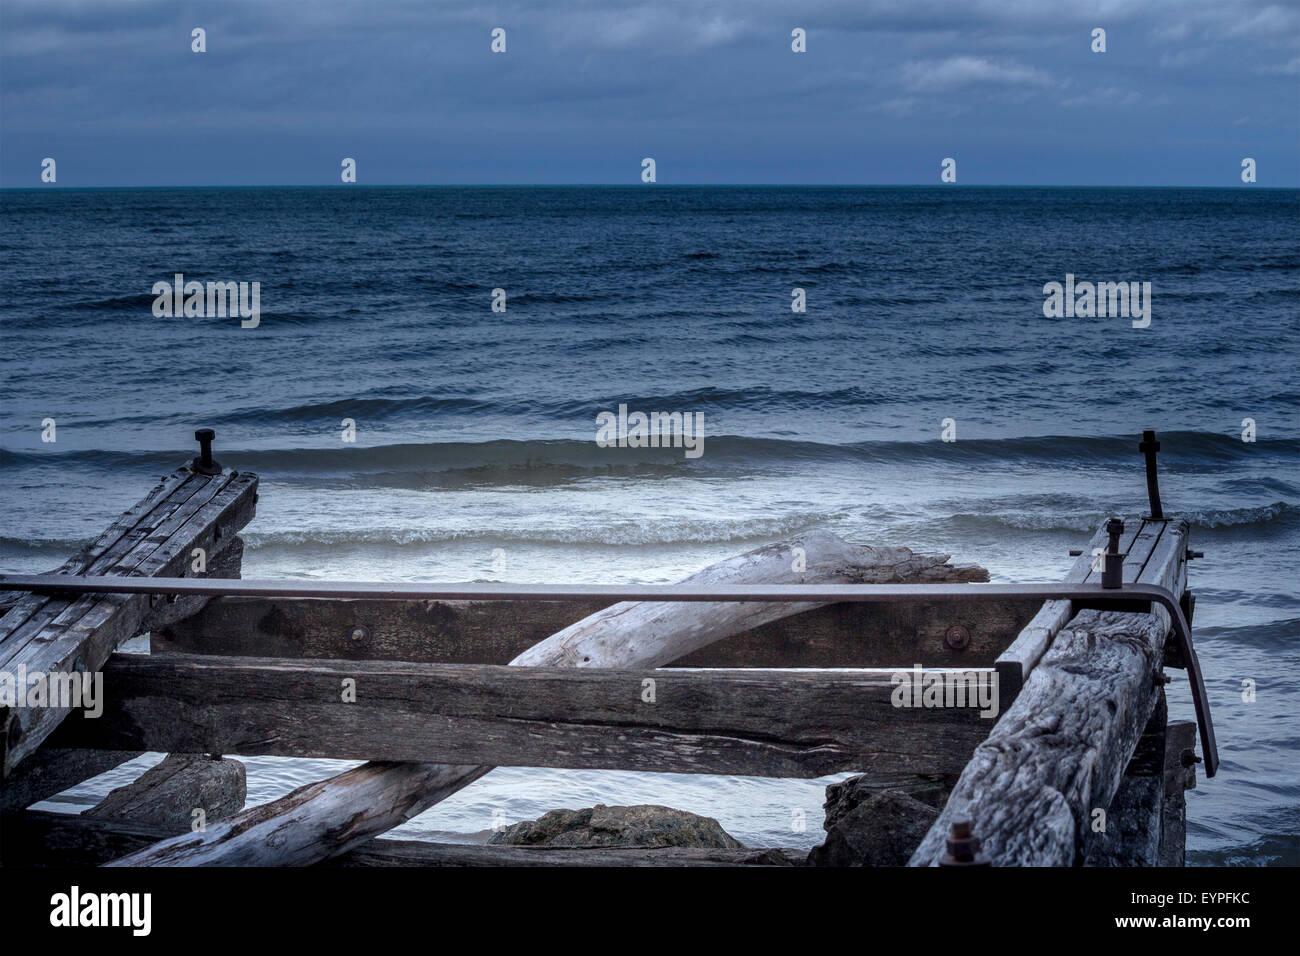 broken-dock-looking-out-to-sea-on-lake-huron-in-grand-bend-ontario-EYPFKC.jpg